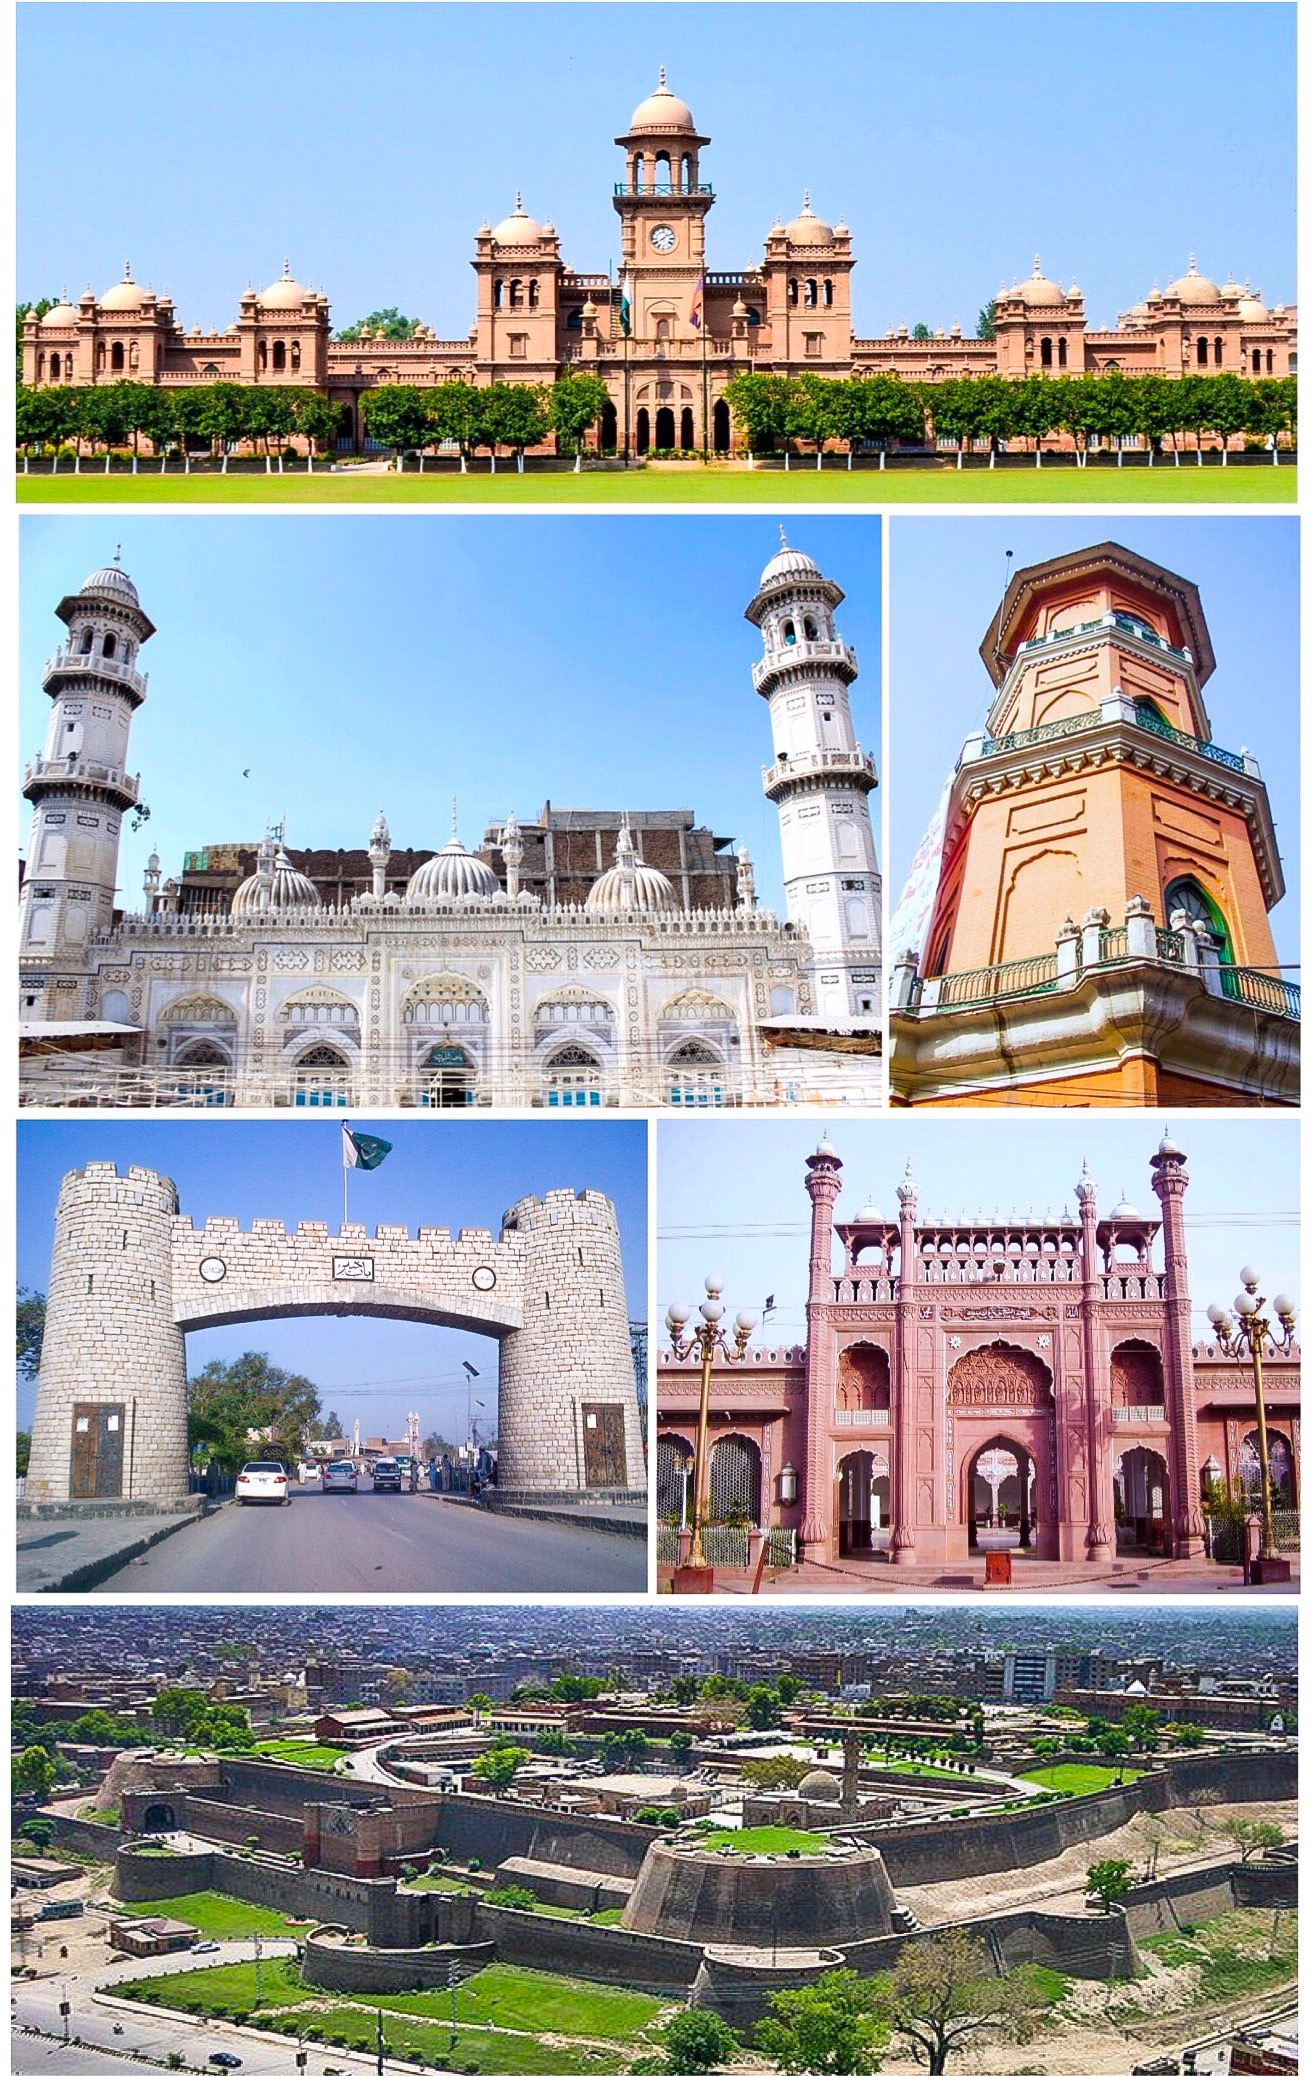 Peshawar - Wikipedia